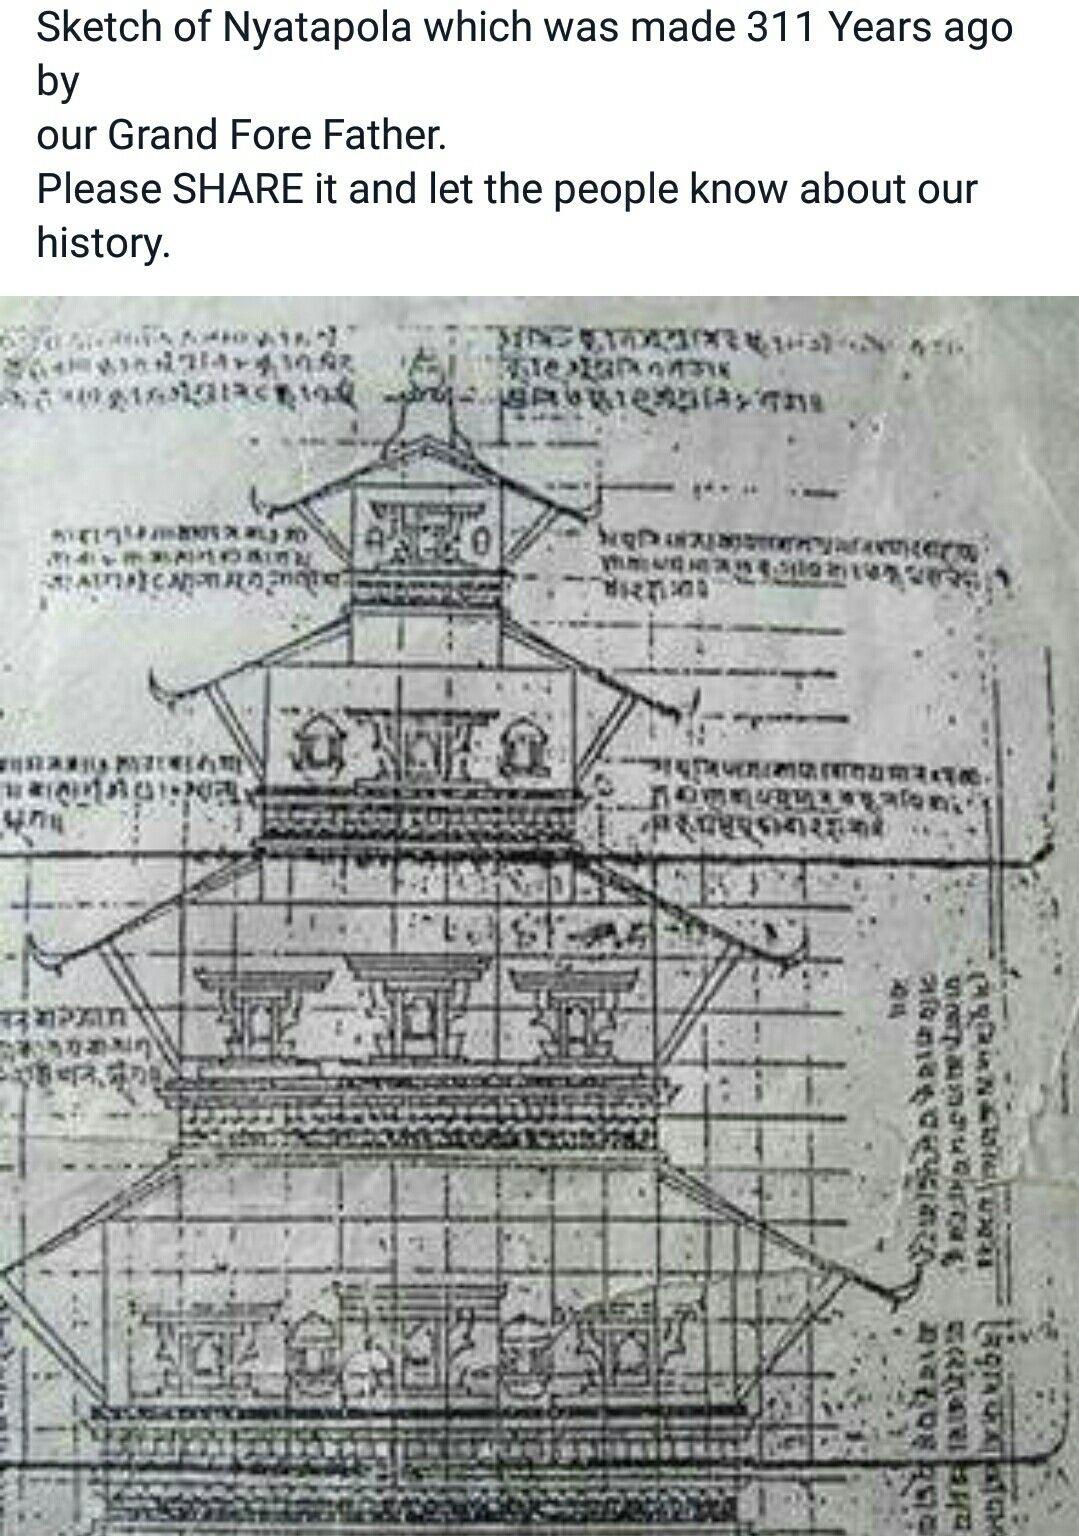 Paris kaalulangus diagramm tahtmatu kaalulangus Harrison